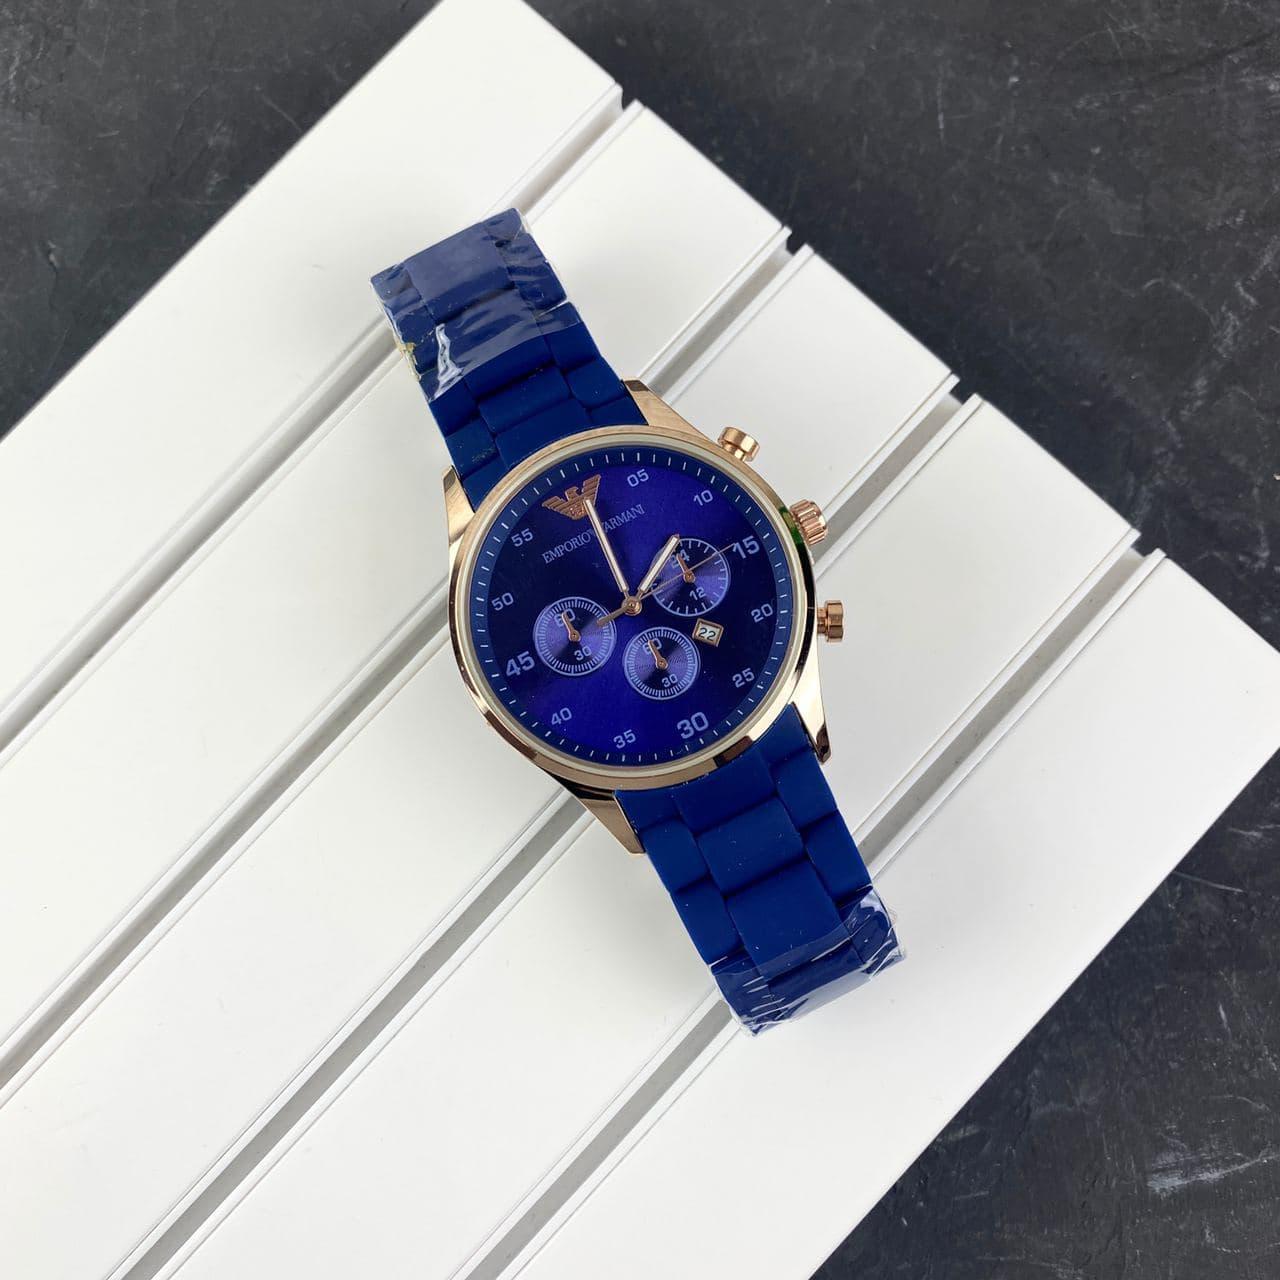 Мужские наручные часы Emporio Armani Silicone 068 Gold-Blue